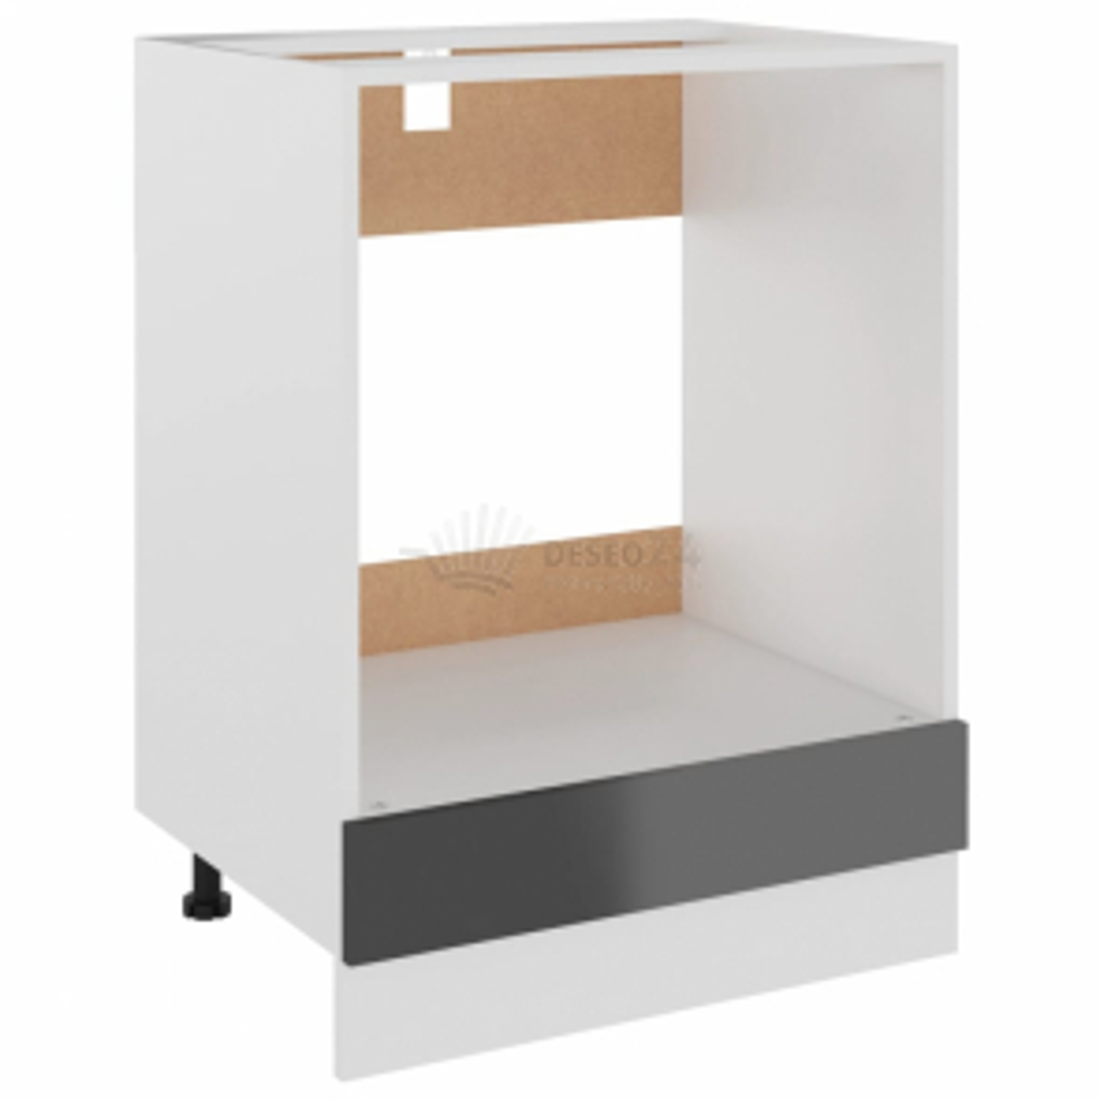 vidaXL Skříňka na troubu šedá vysoký lesk 60x46x81,5 cm dřevotříska [802504]